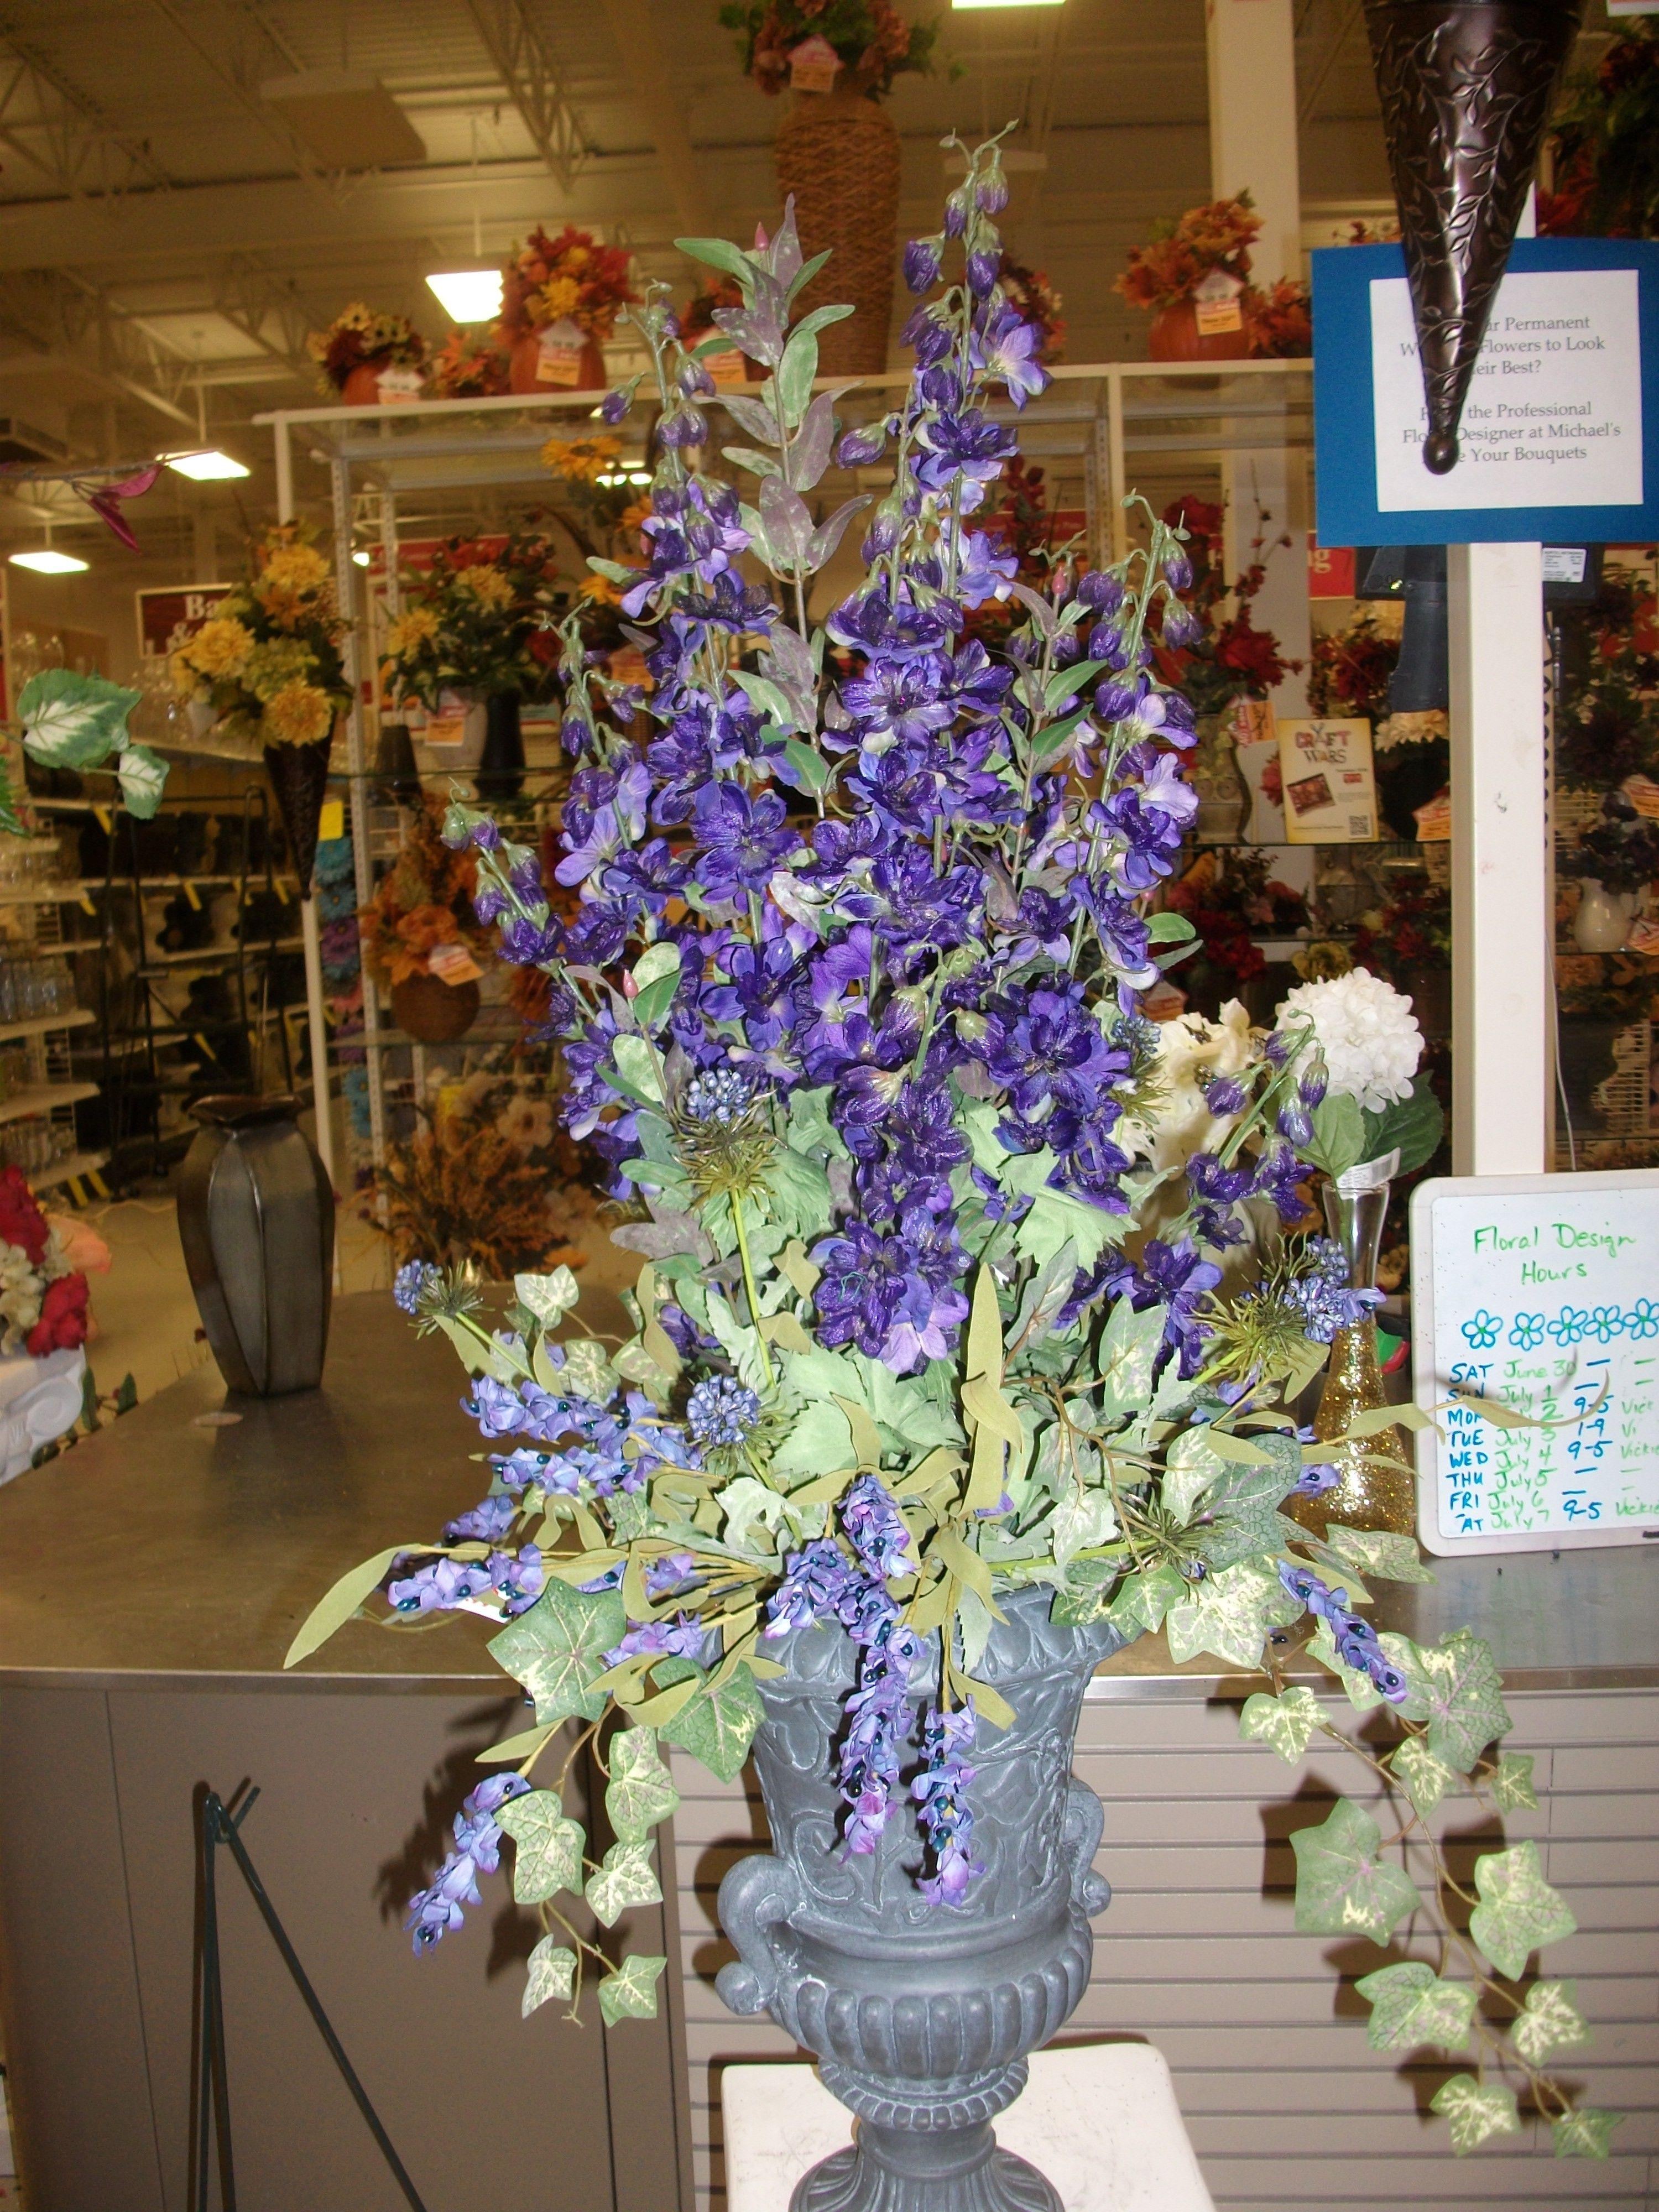 Delphinium Urn Everyday Pinterest Delphiniums And Flowers